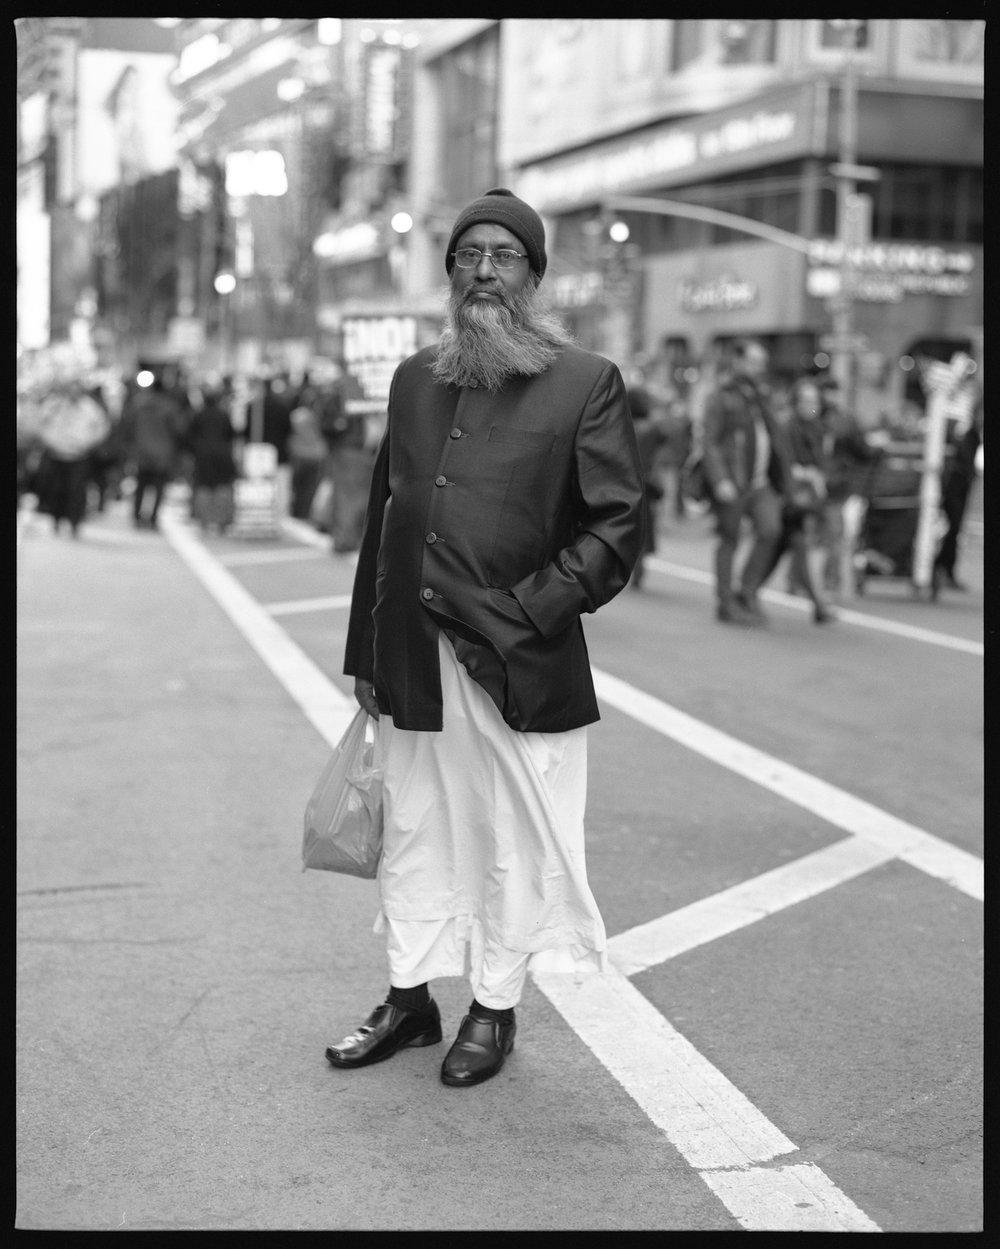 amber_mahoney_the_resistance_today_i_am_muslim_too_new_york_014.jpg